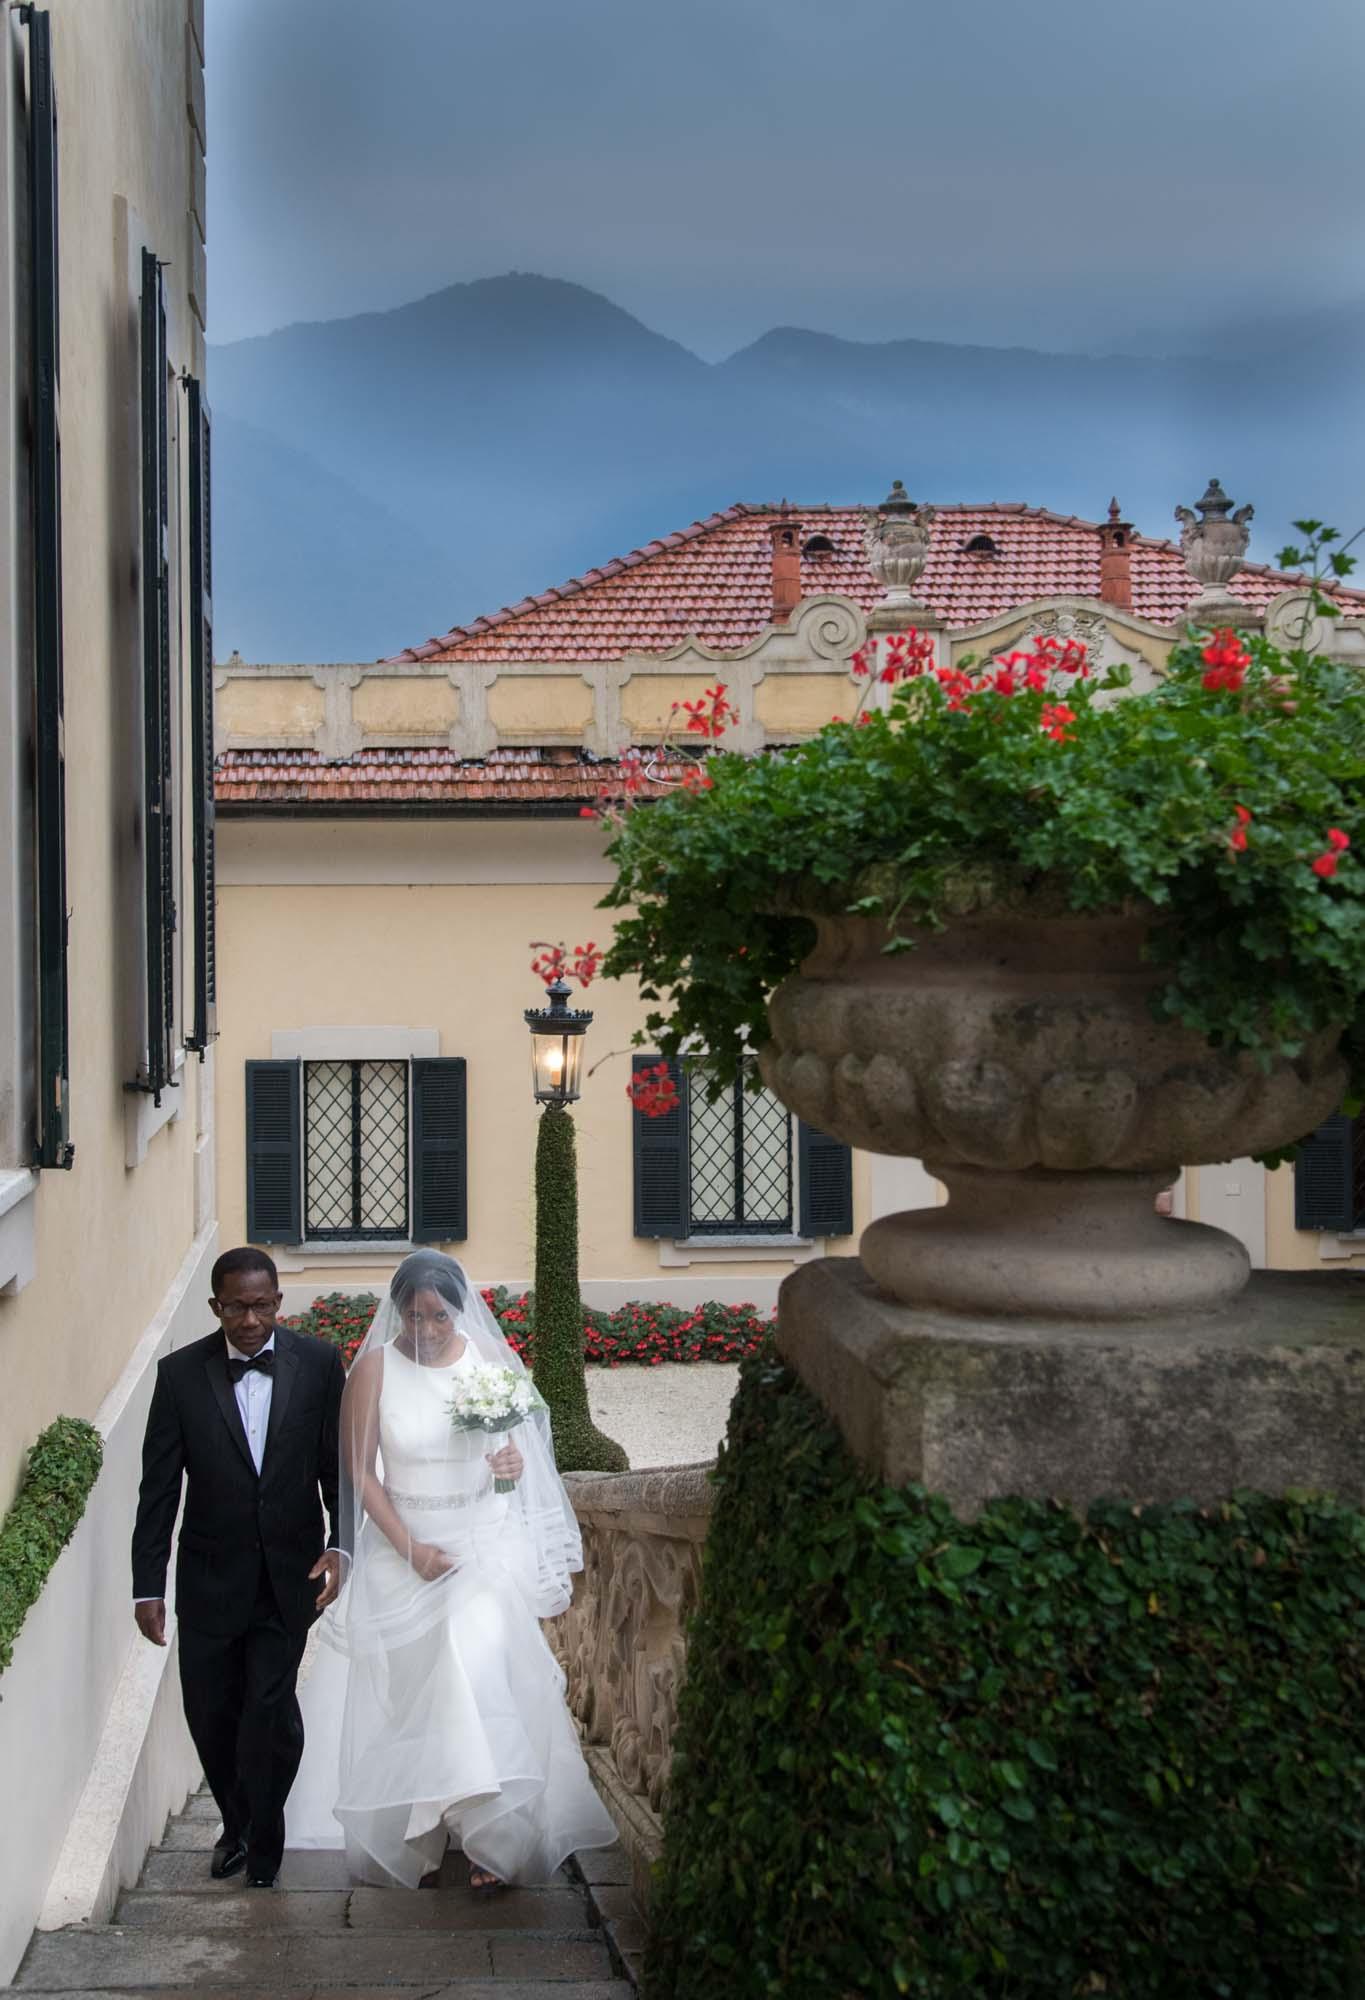 Lake-Como-Italy-Wedding-Jamie-Levine-Photography-8.jpg